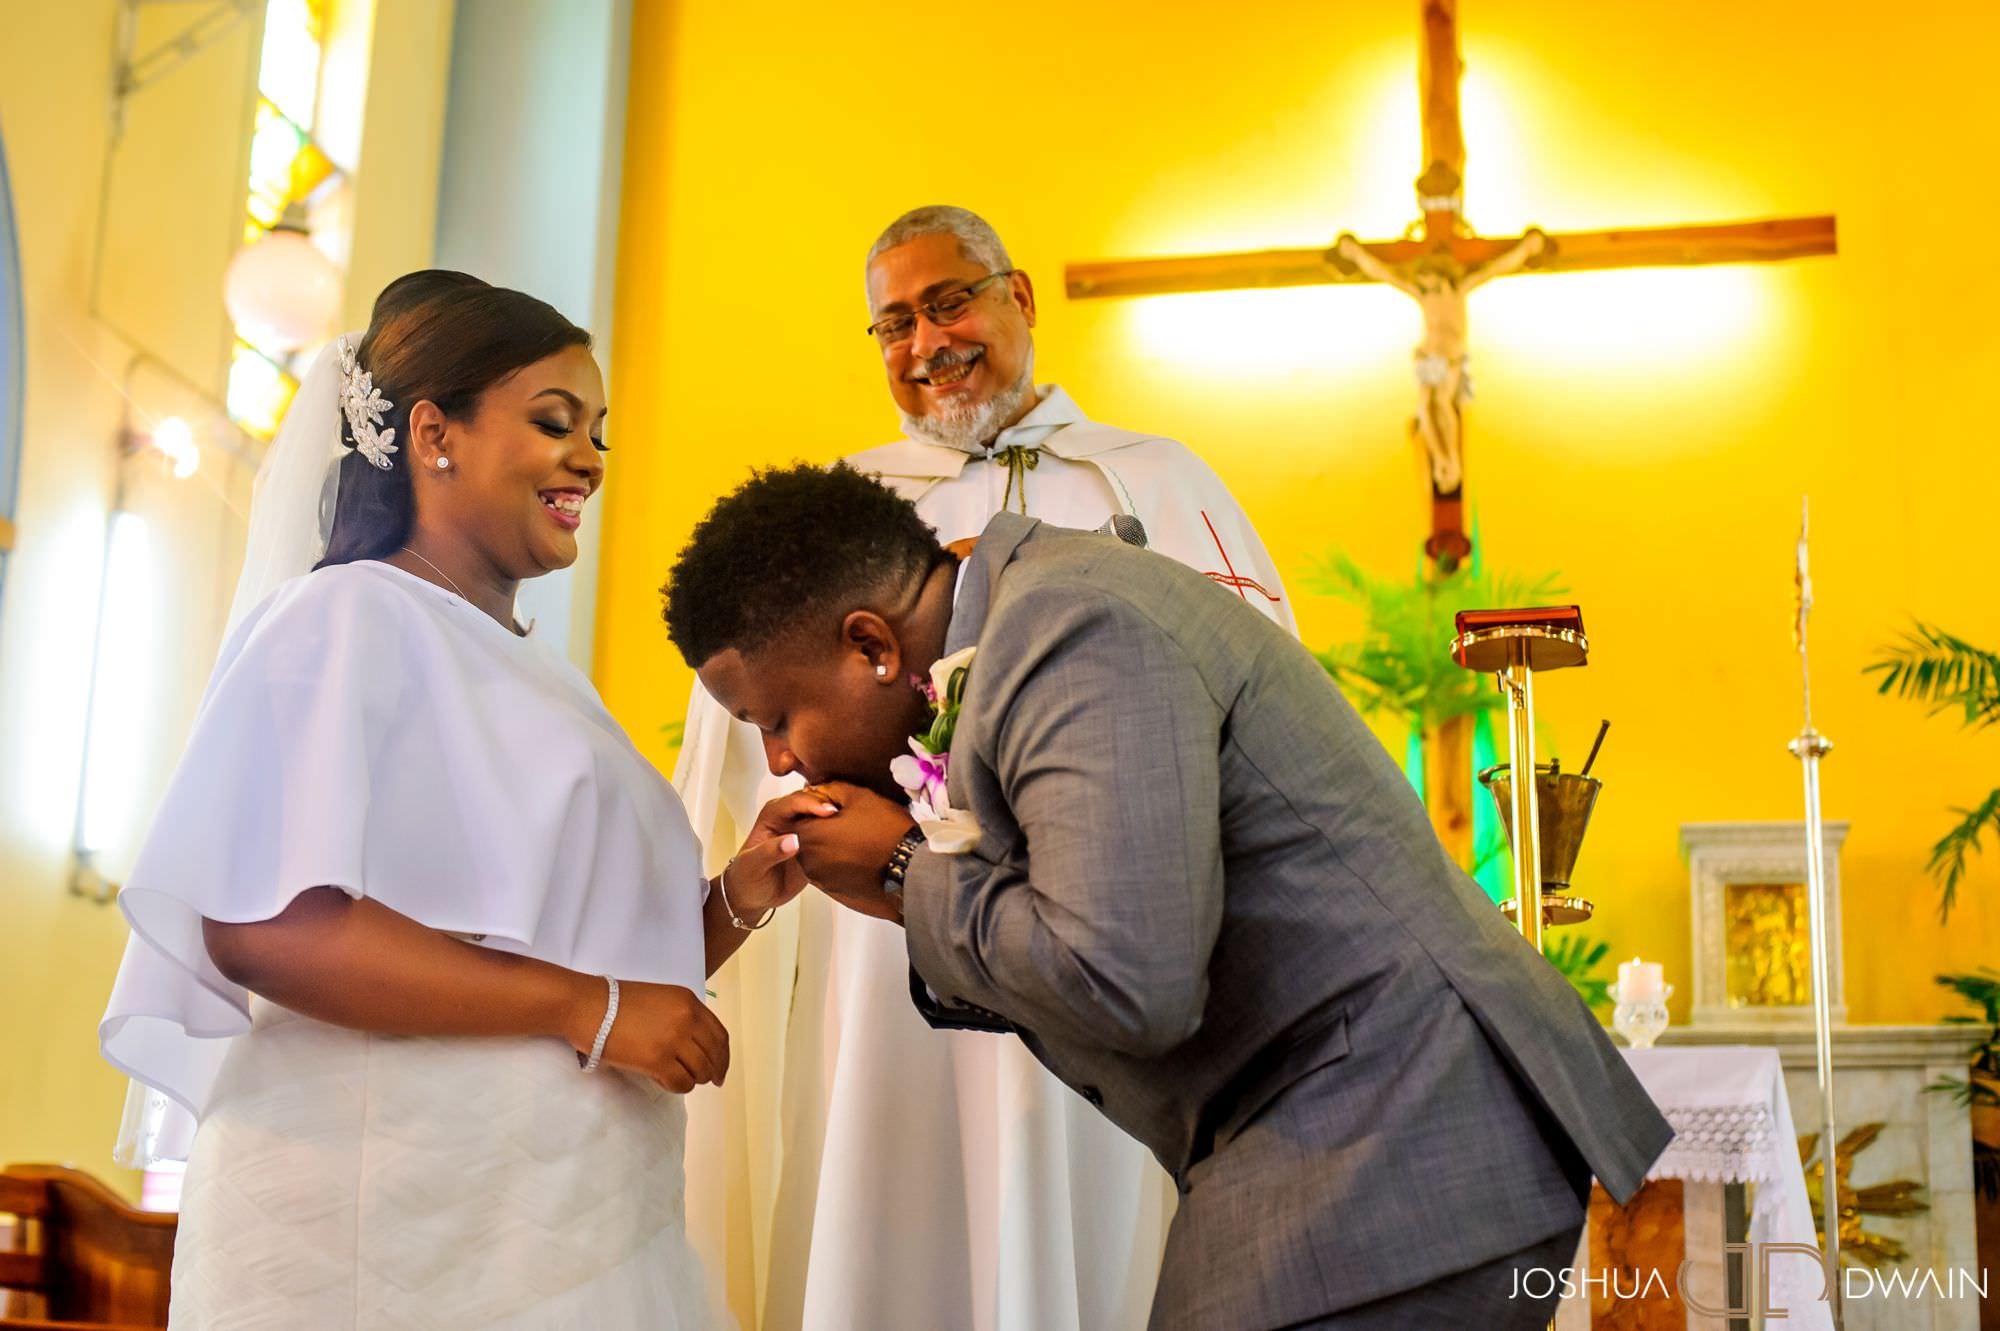 Shana & Kalesi's Wedding in San Fernando Trinidad at Nia Valley